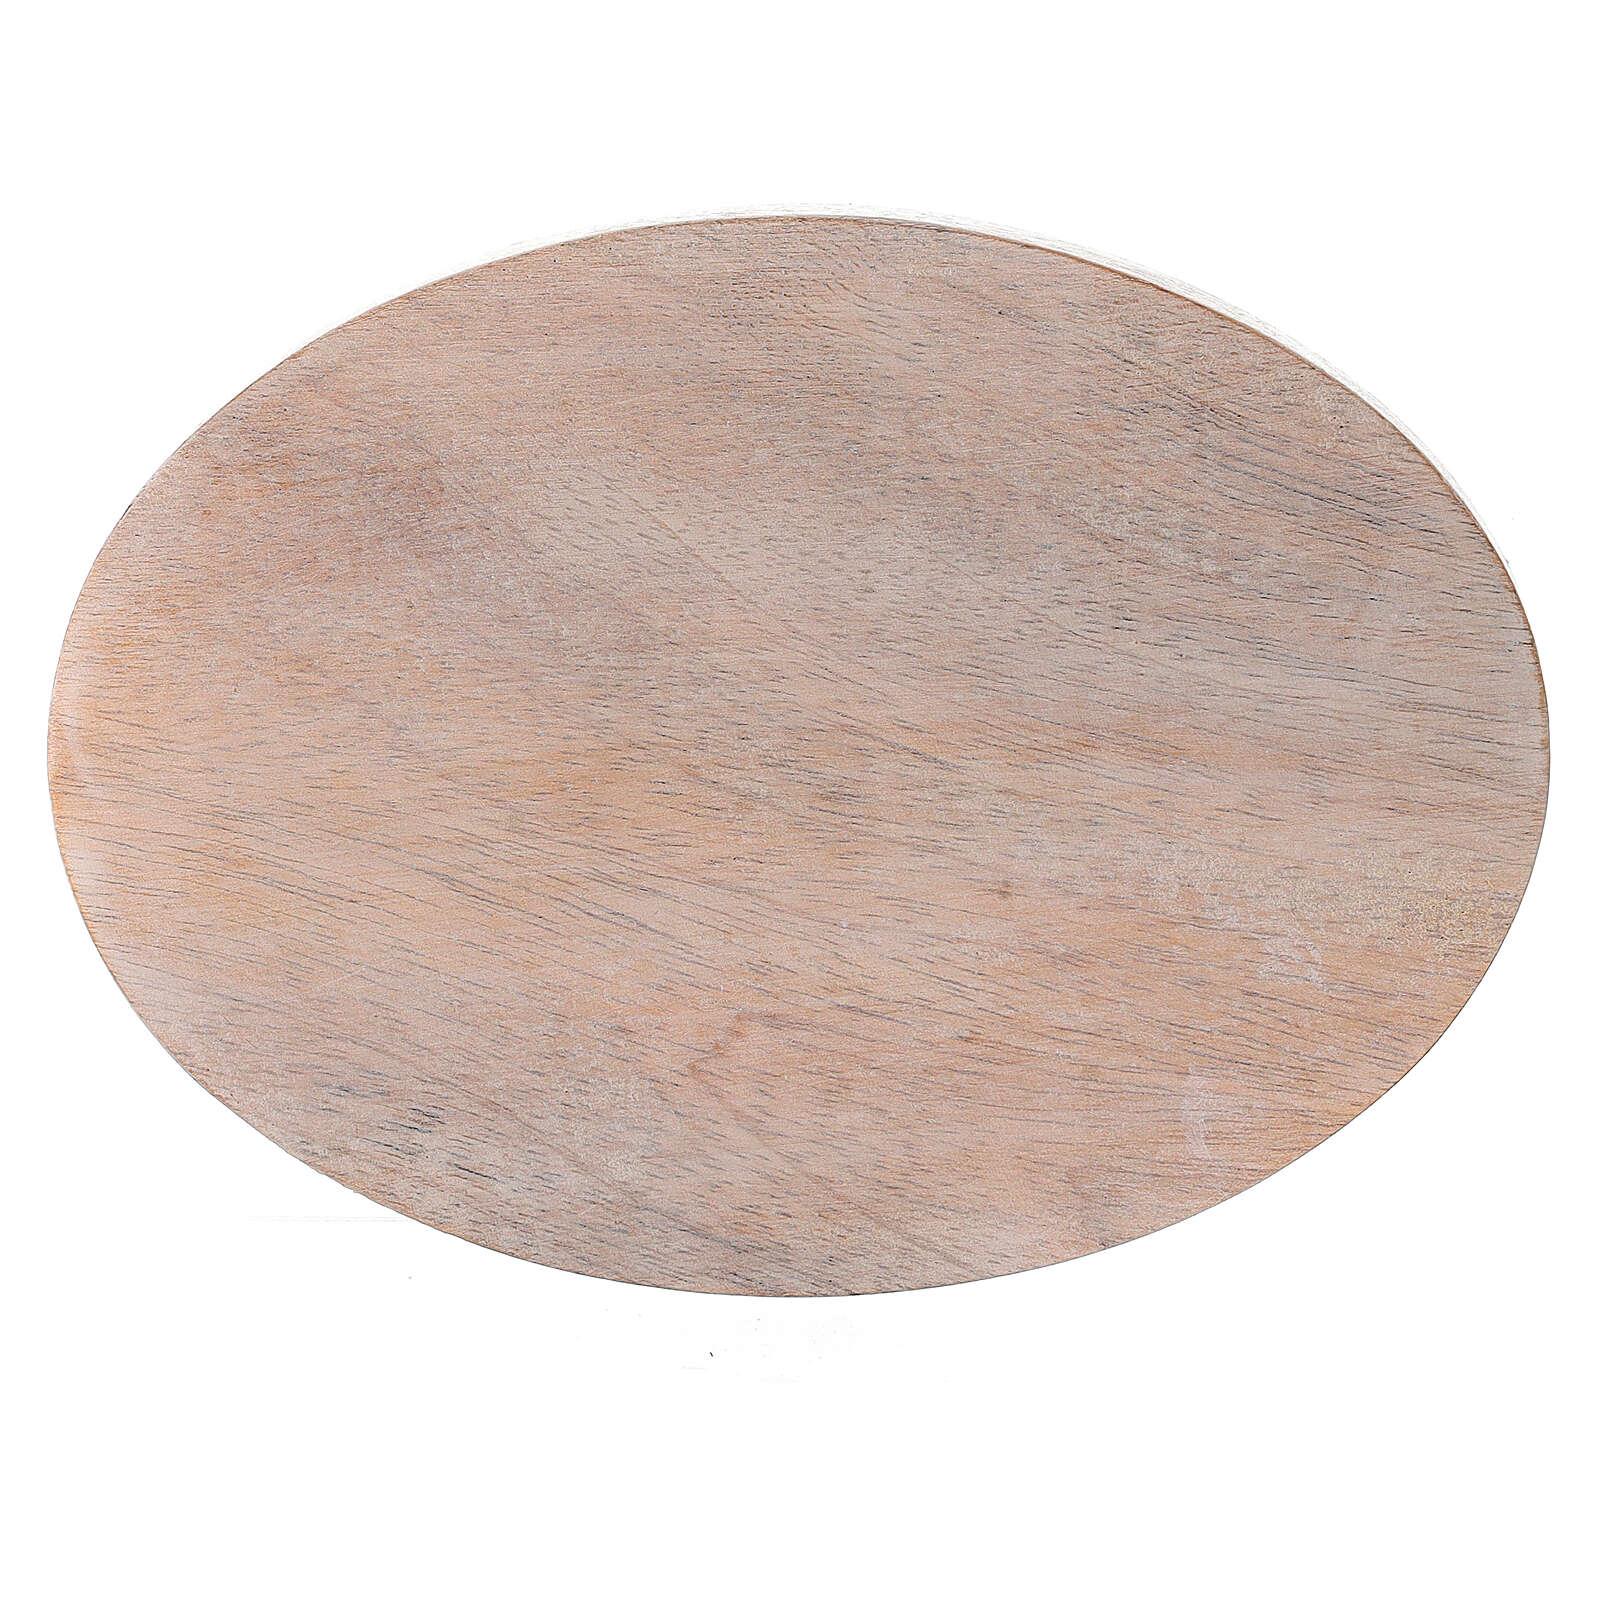 Plato portavela madera mango claro ovalado 13,5x10 cm 3